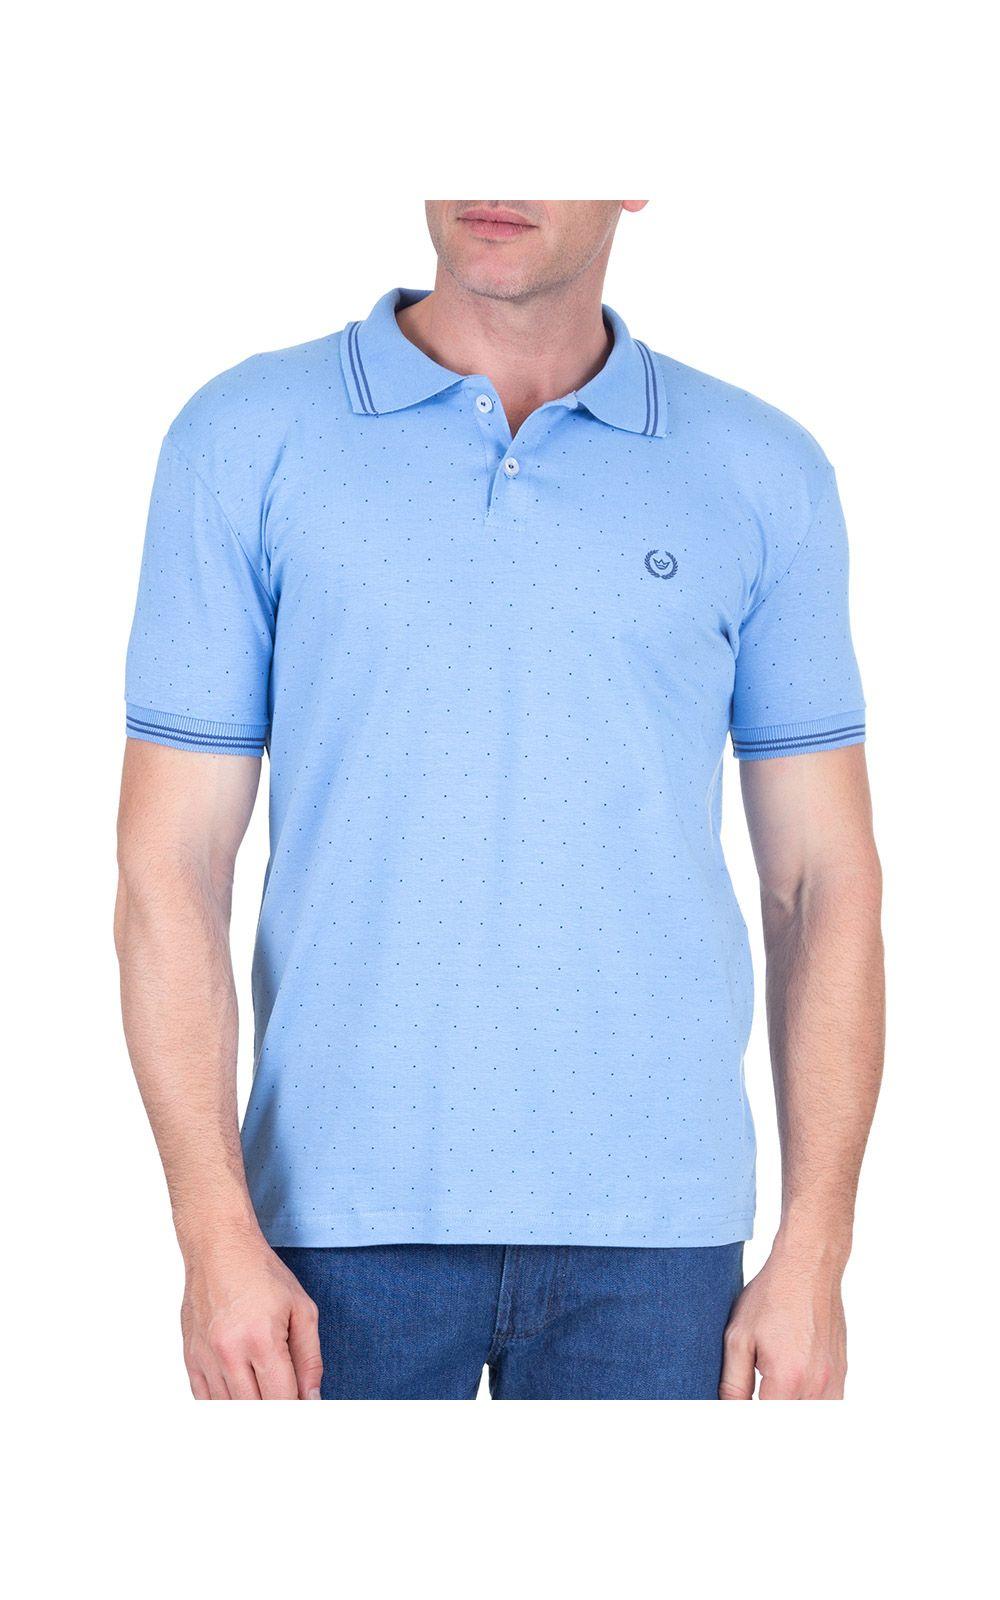 Foto 1 - Camisa Polo Masculina Azul Estampada